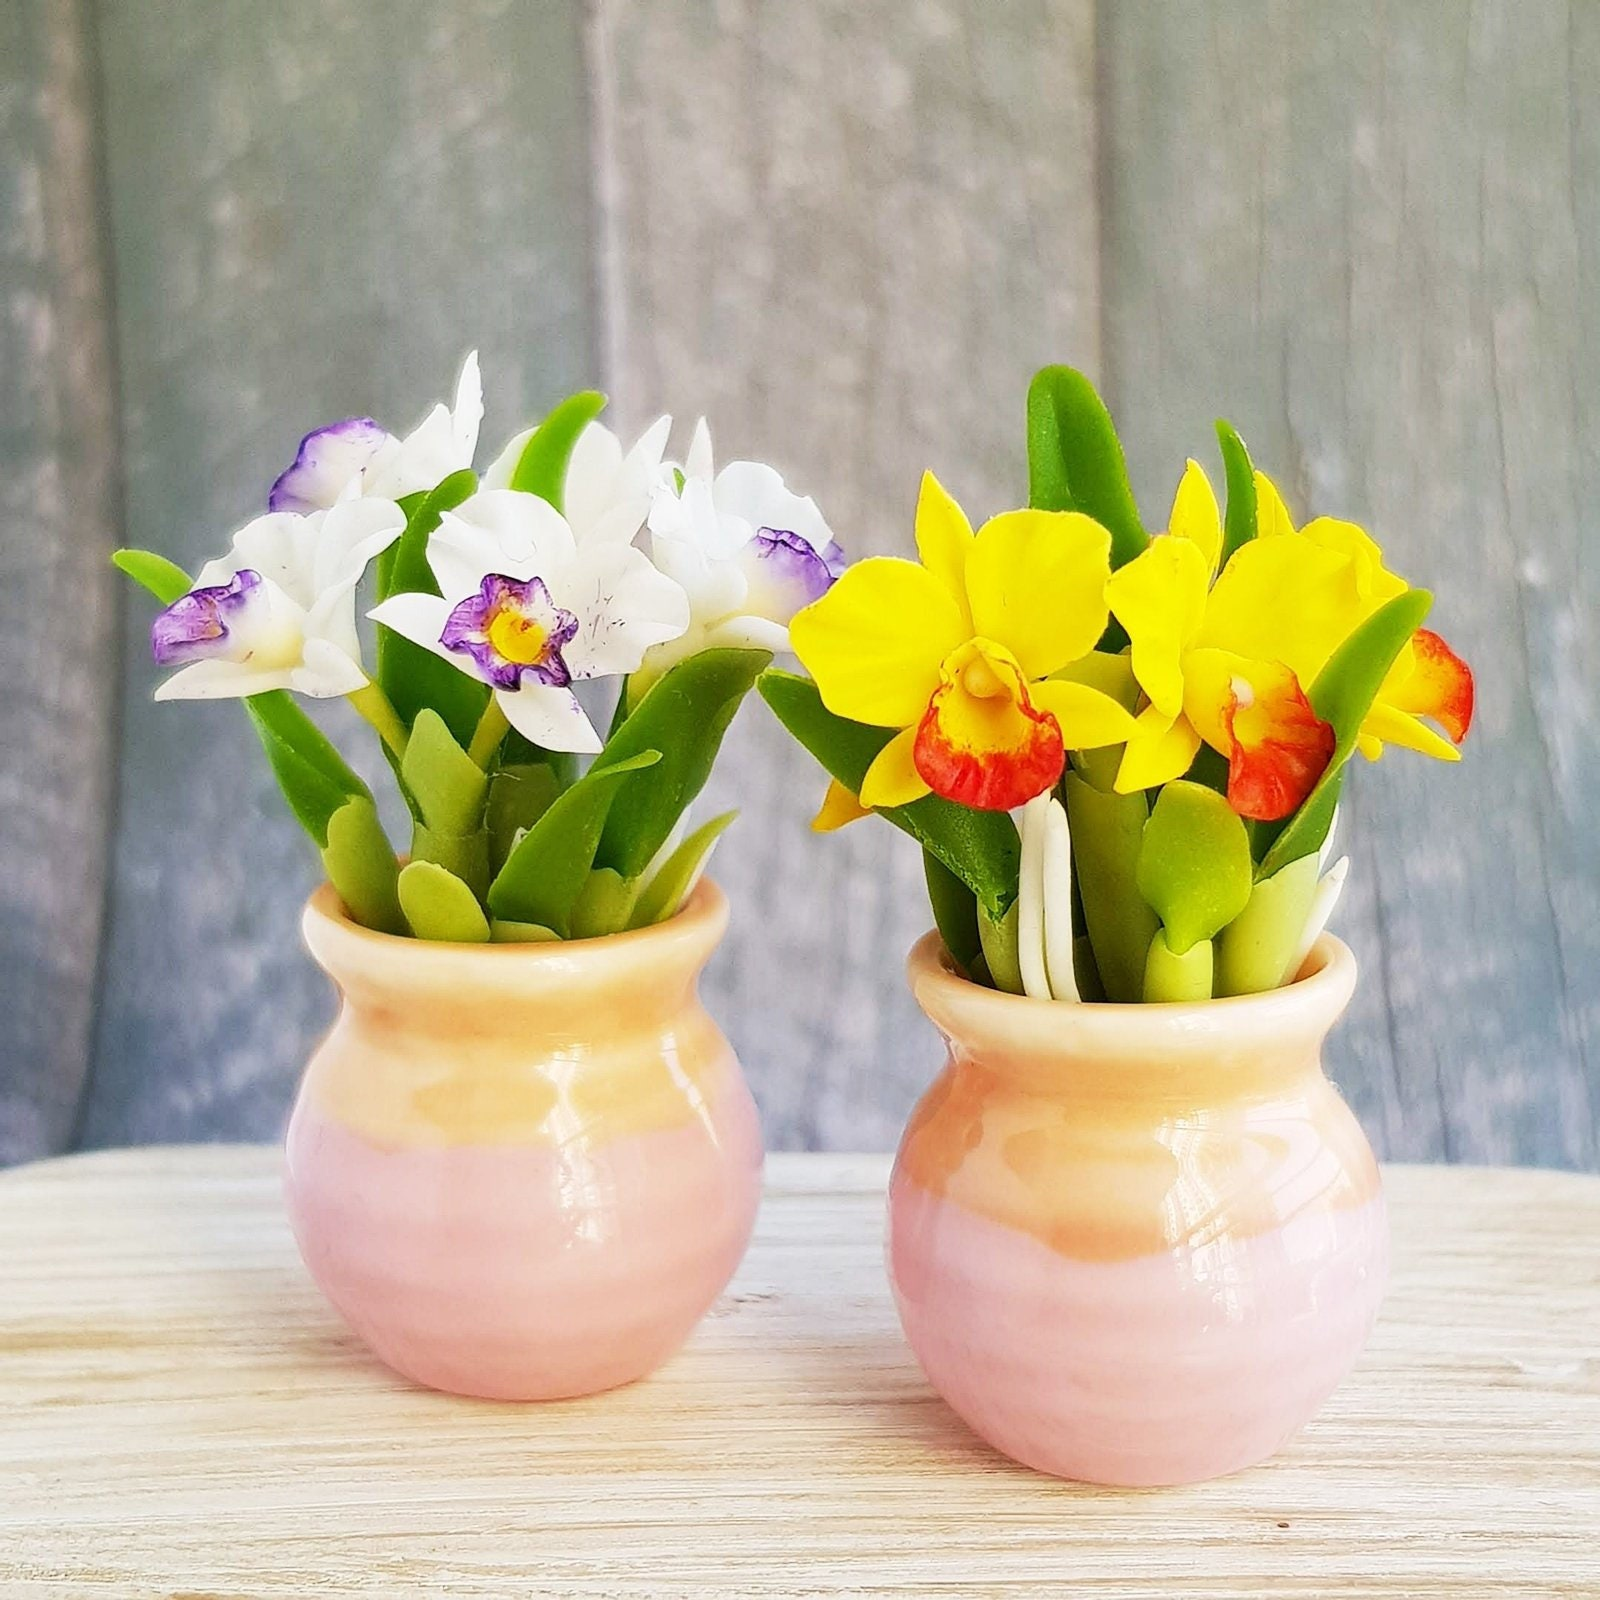 10x Morning Glories Clay Flower in Ceramic Vase Pot Dollhouse Miniature Handmade